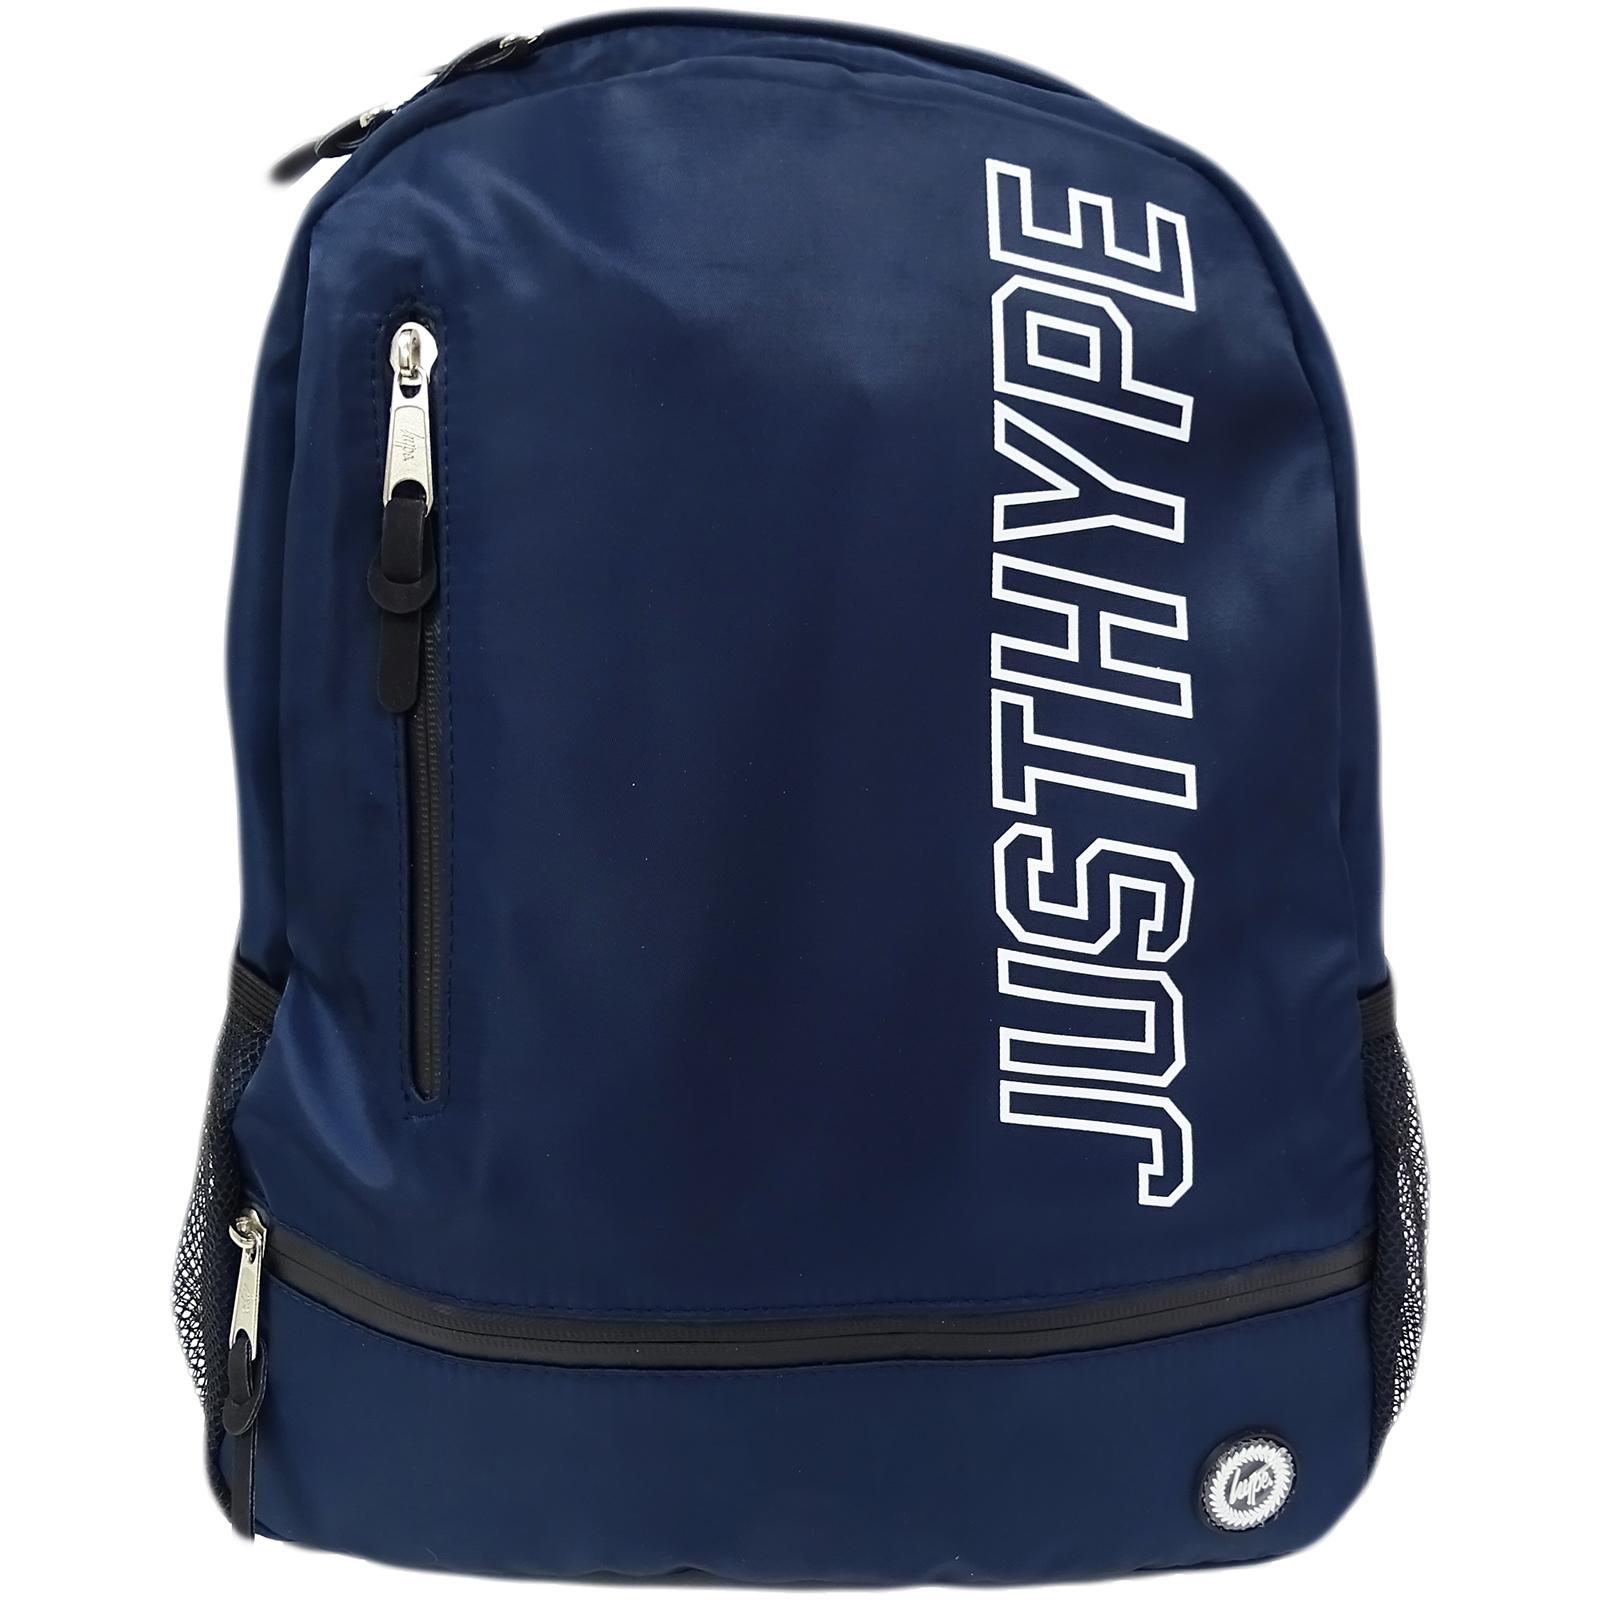 Hype Navy Rucksack   Backpack Bag - Justhype Urban 7106078627507  05768de811475